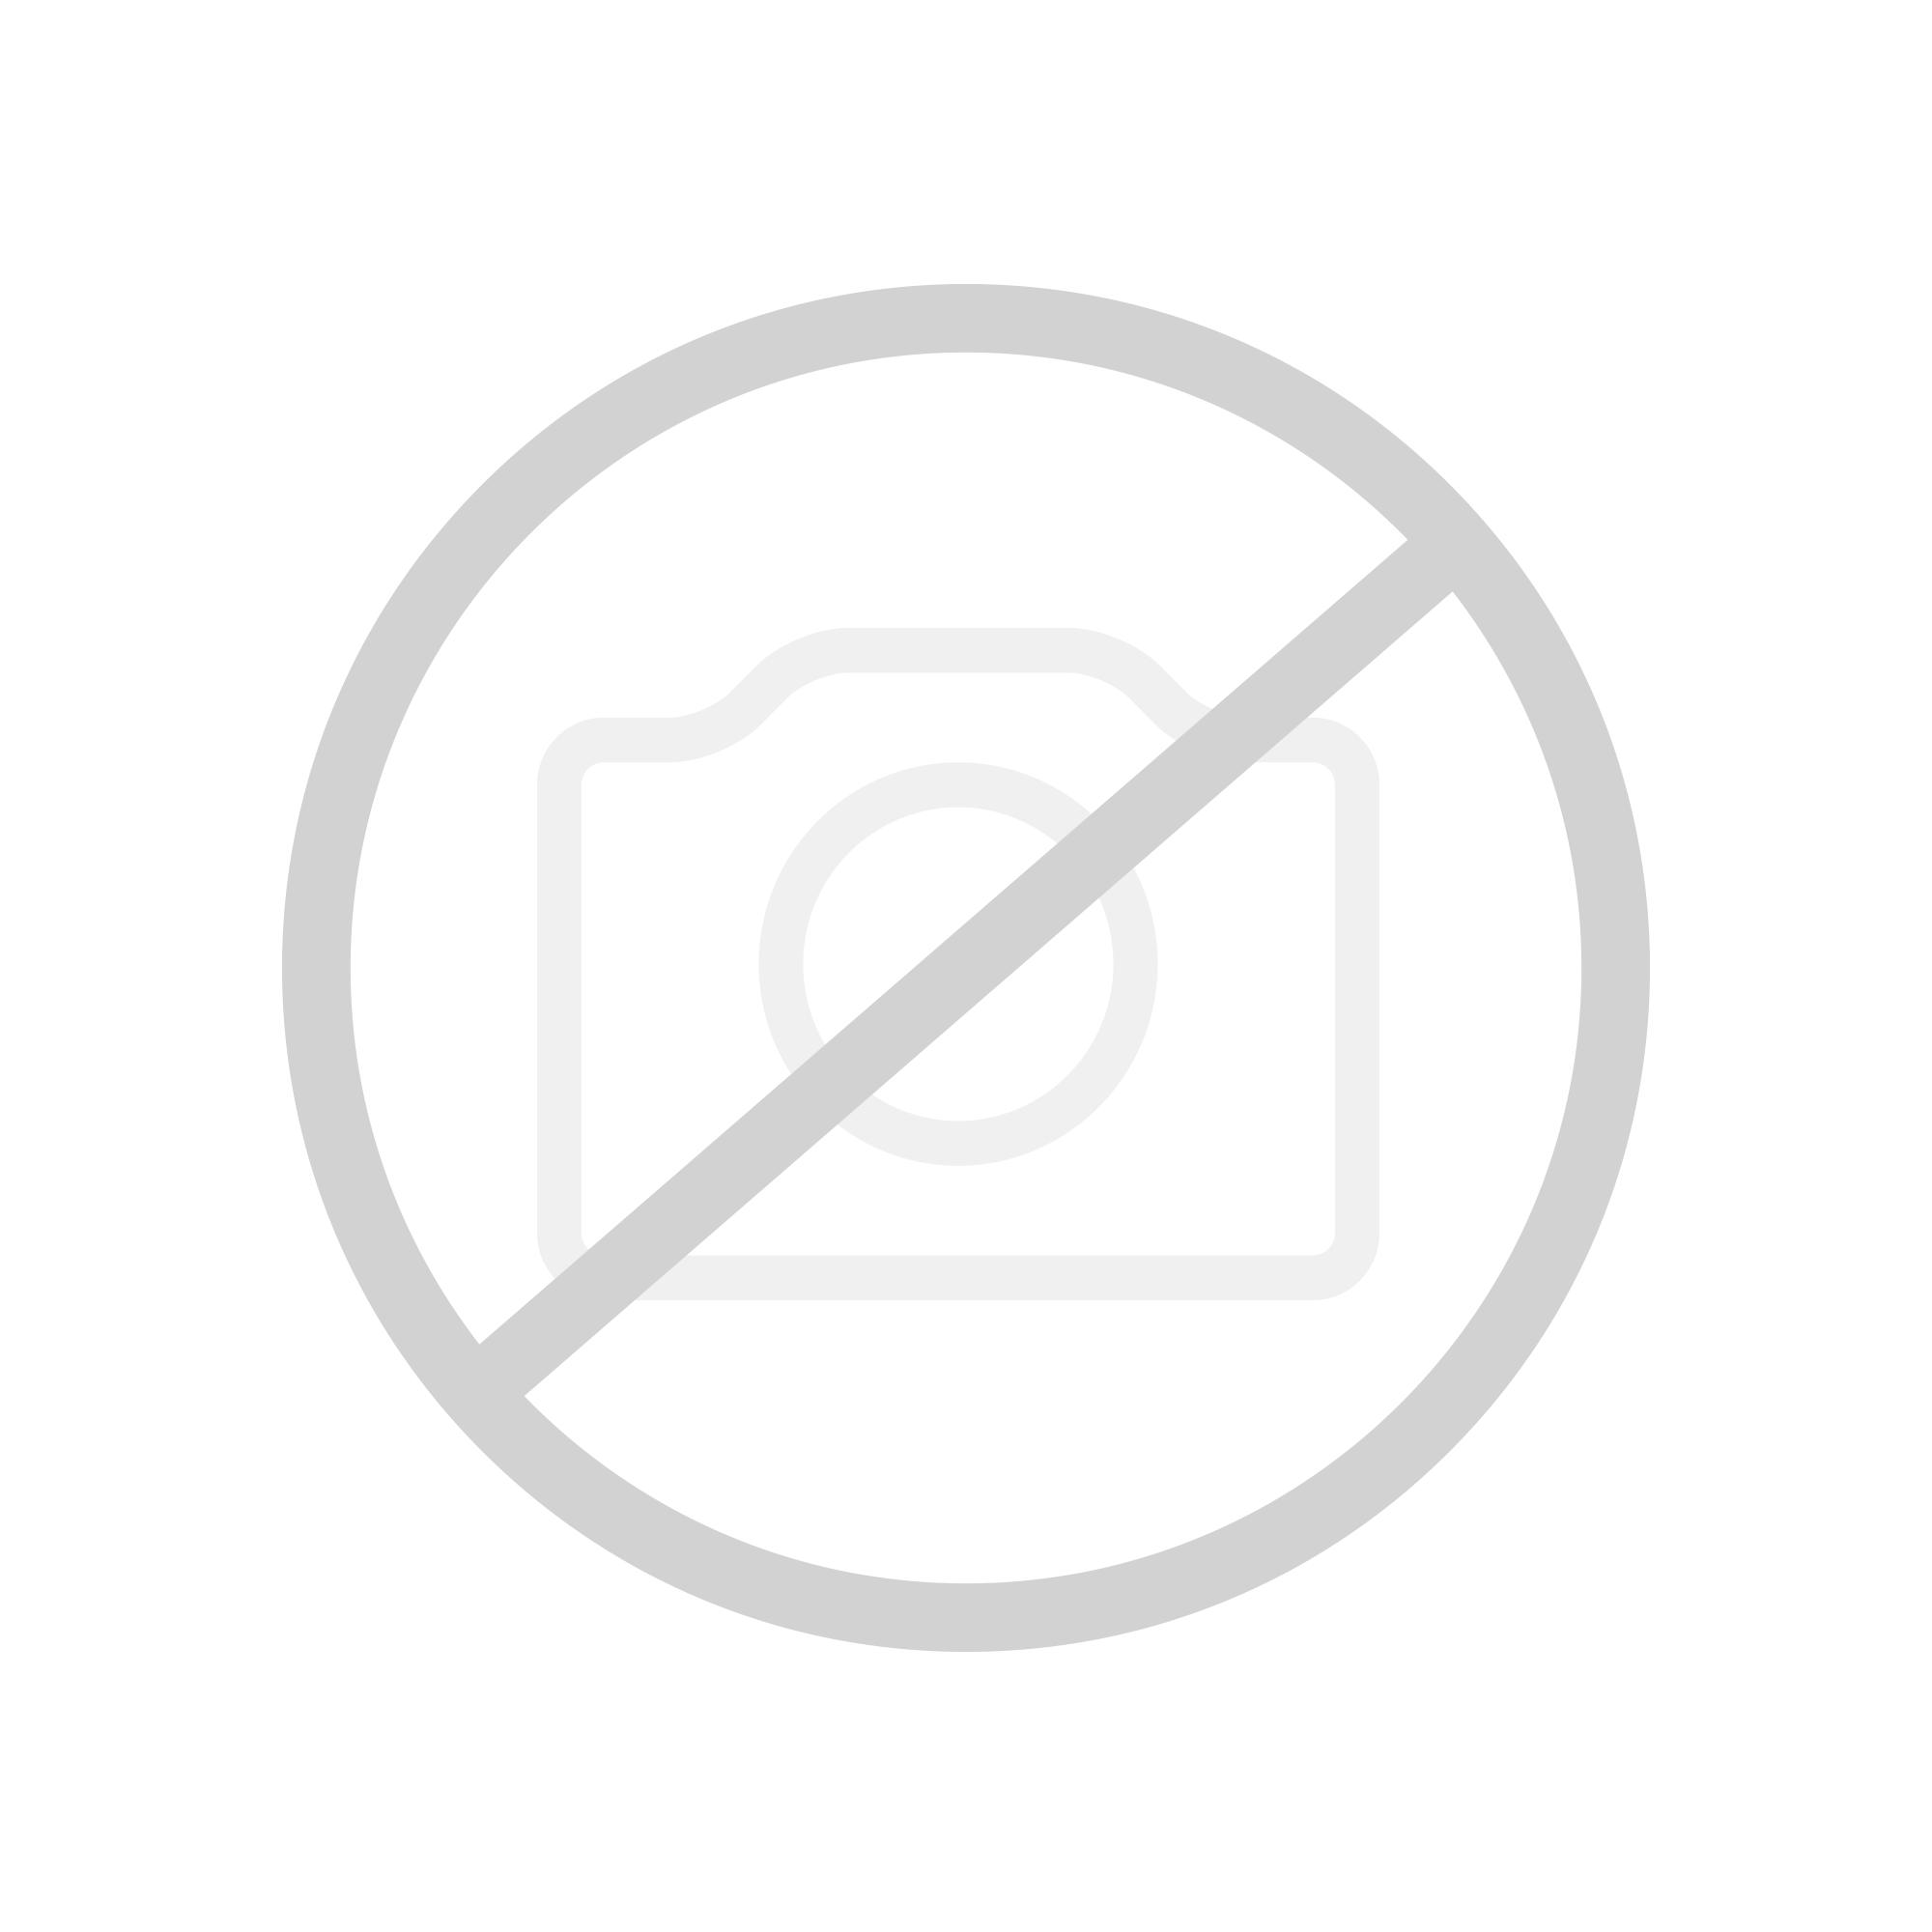 louis poulsen NJP LED Wandleuchte short mit Dimmer und Zuleitung